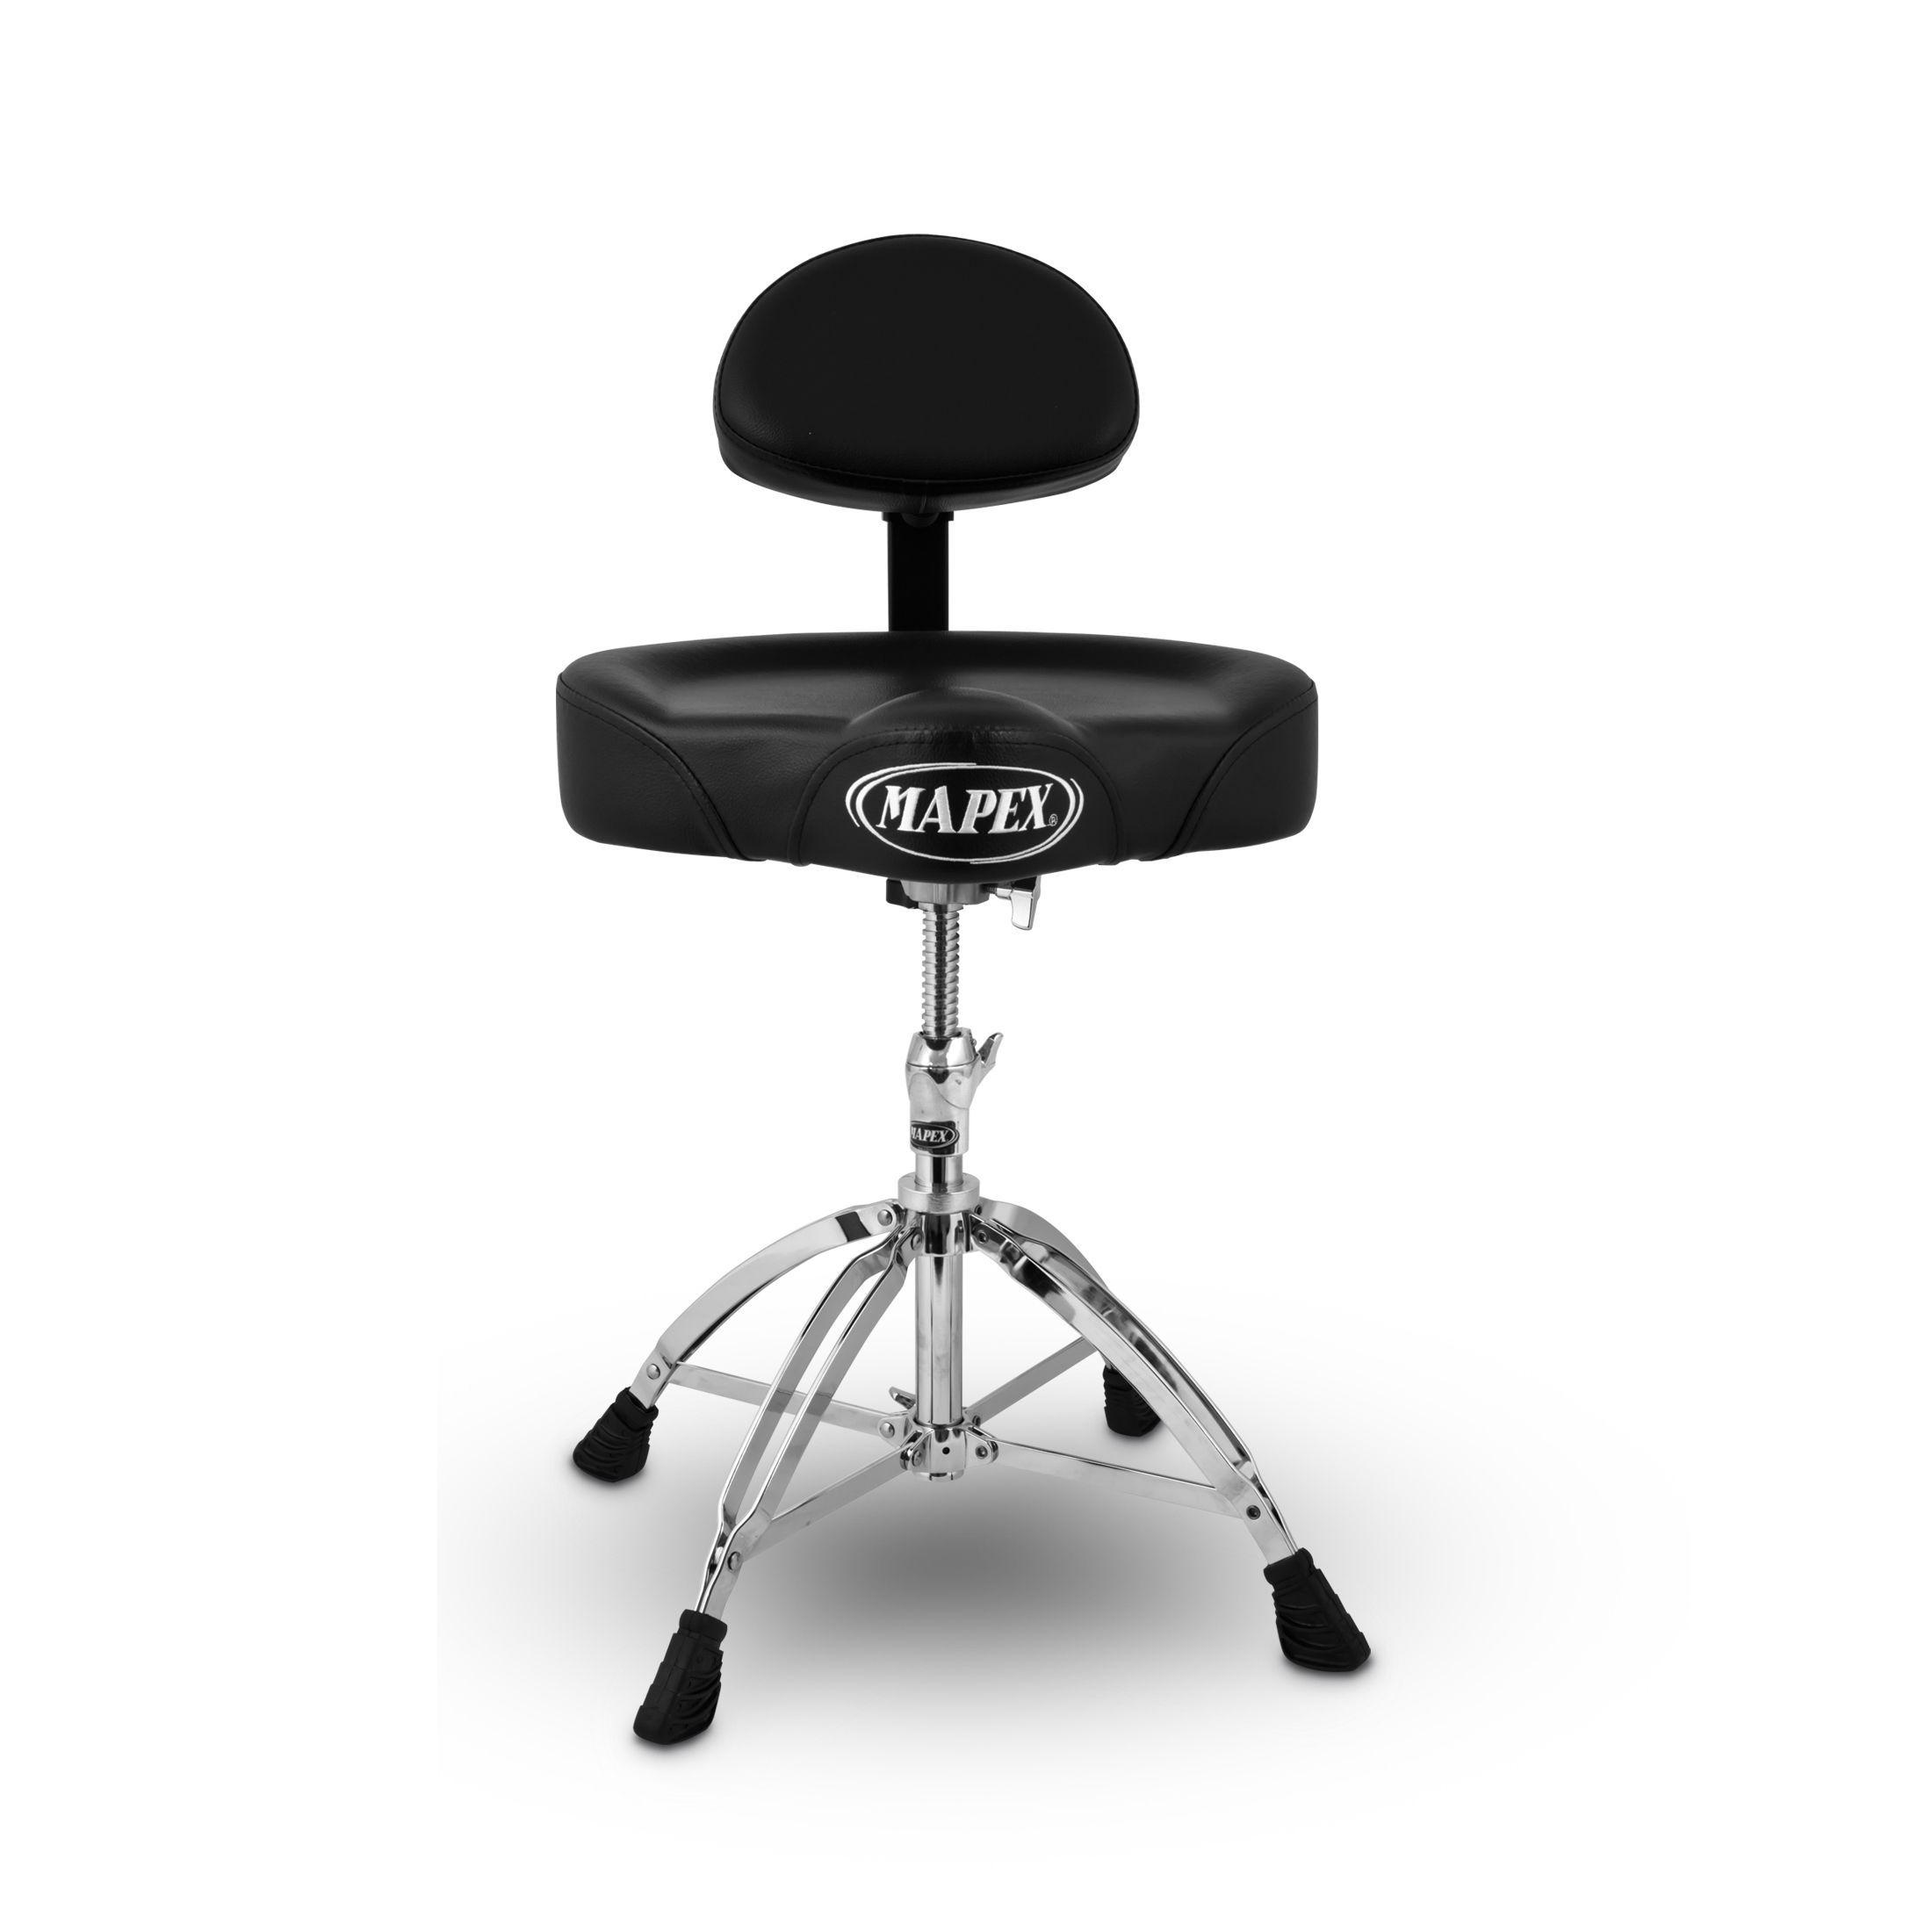 Remarkable Mapex Double Braced Height Adjustable Saddle Seat Back Rest Cjindustries Chair Design For Home Cjindustriesco